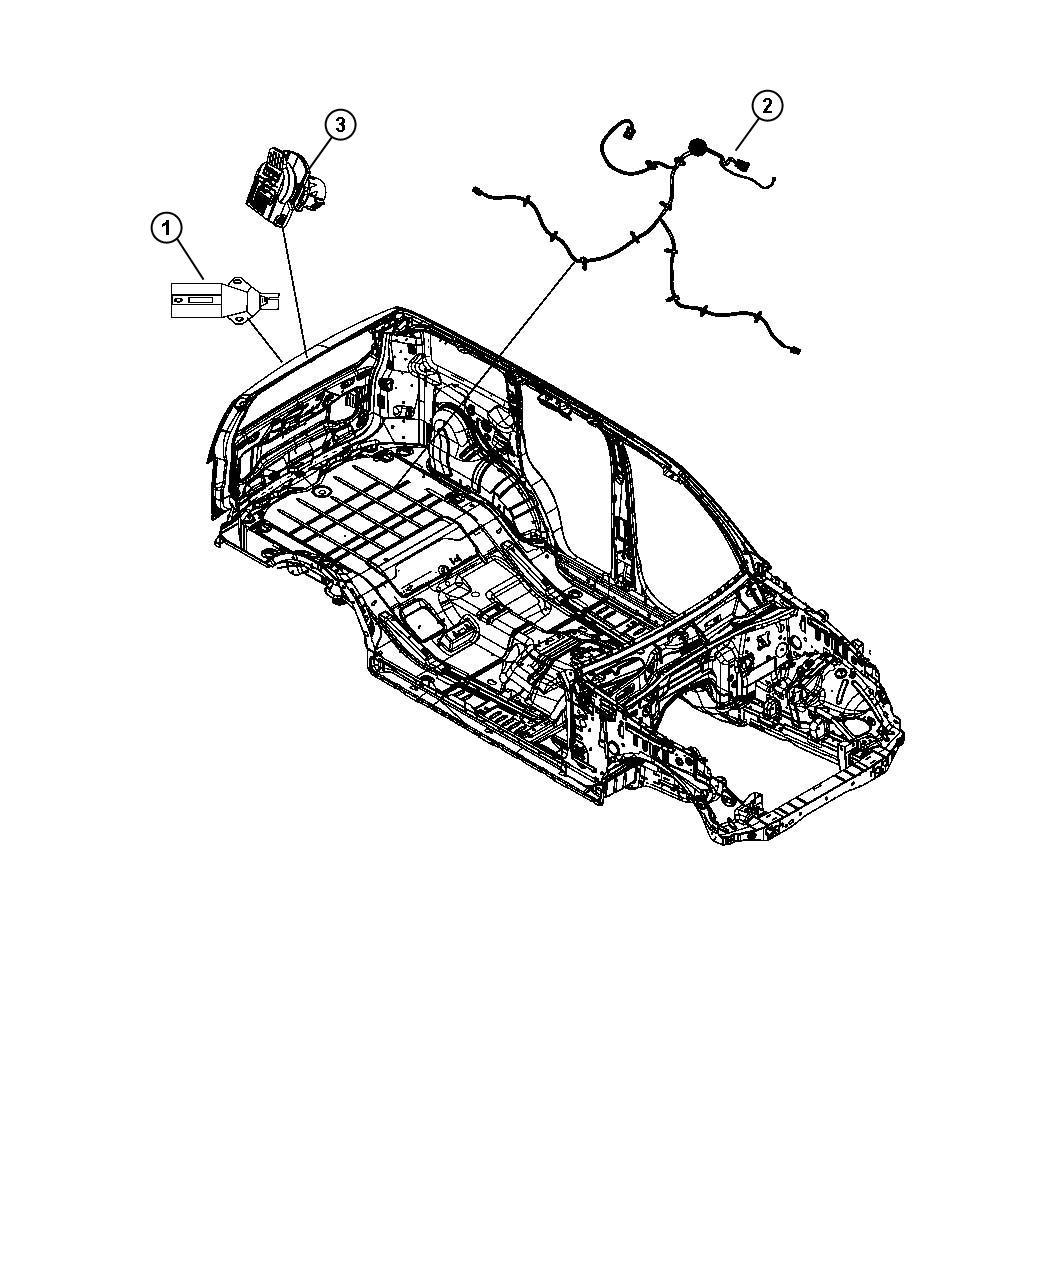 Dodge Nitro Wiring Fuel Tank 18 5 Gallon Fuel Tank